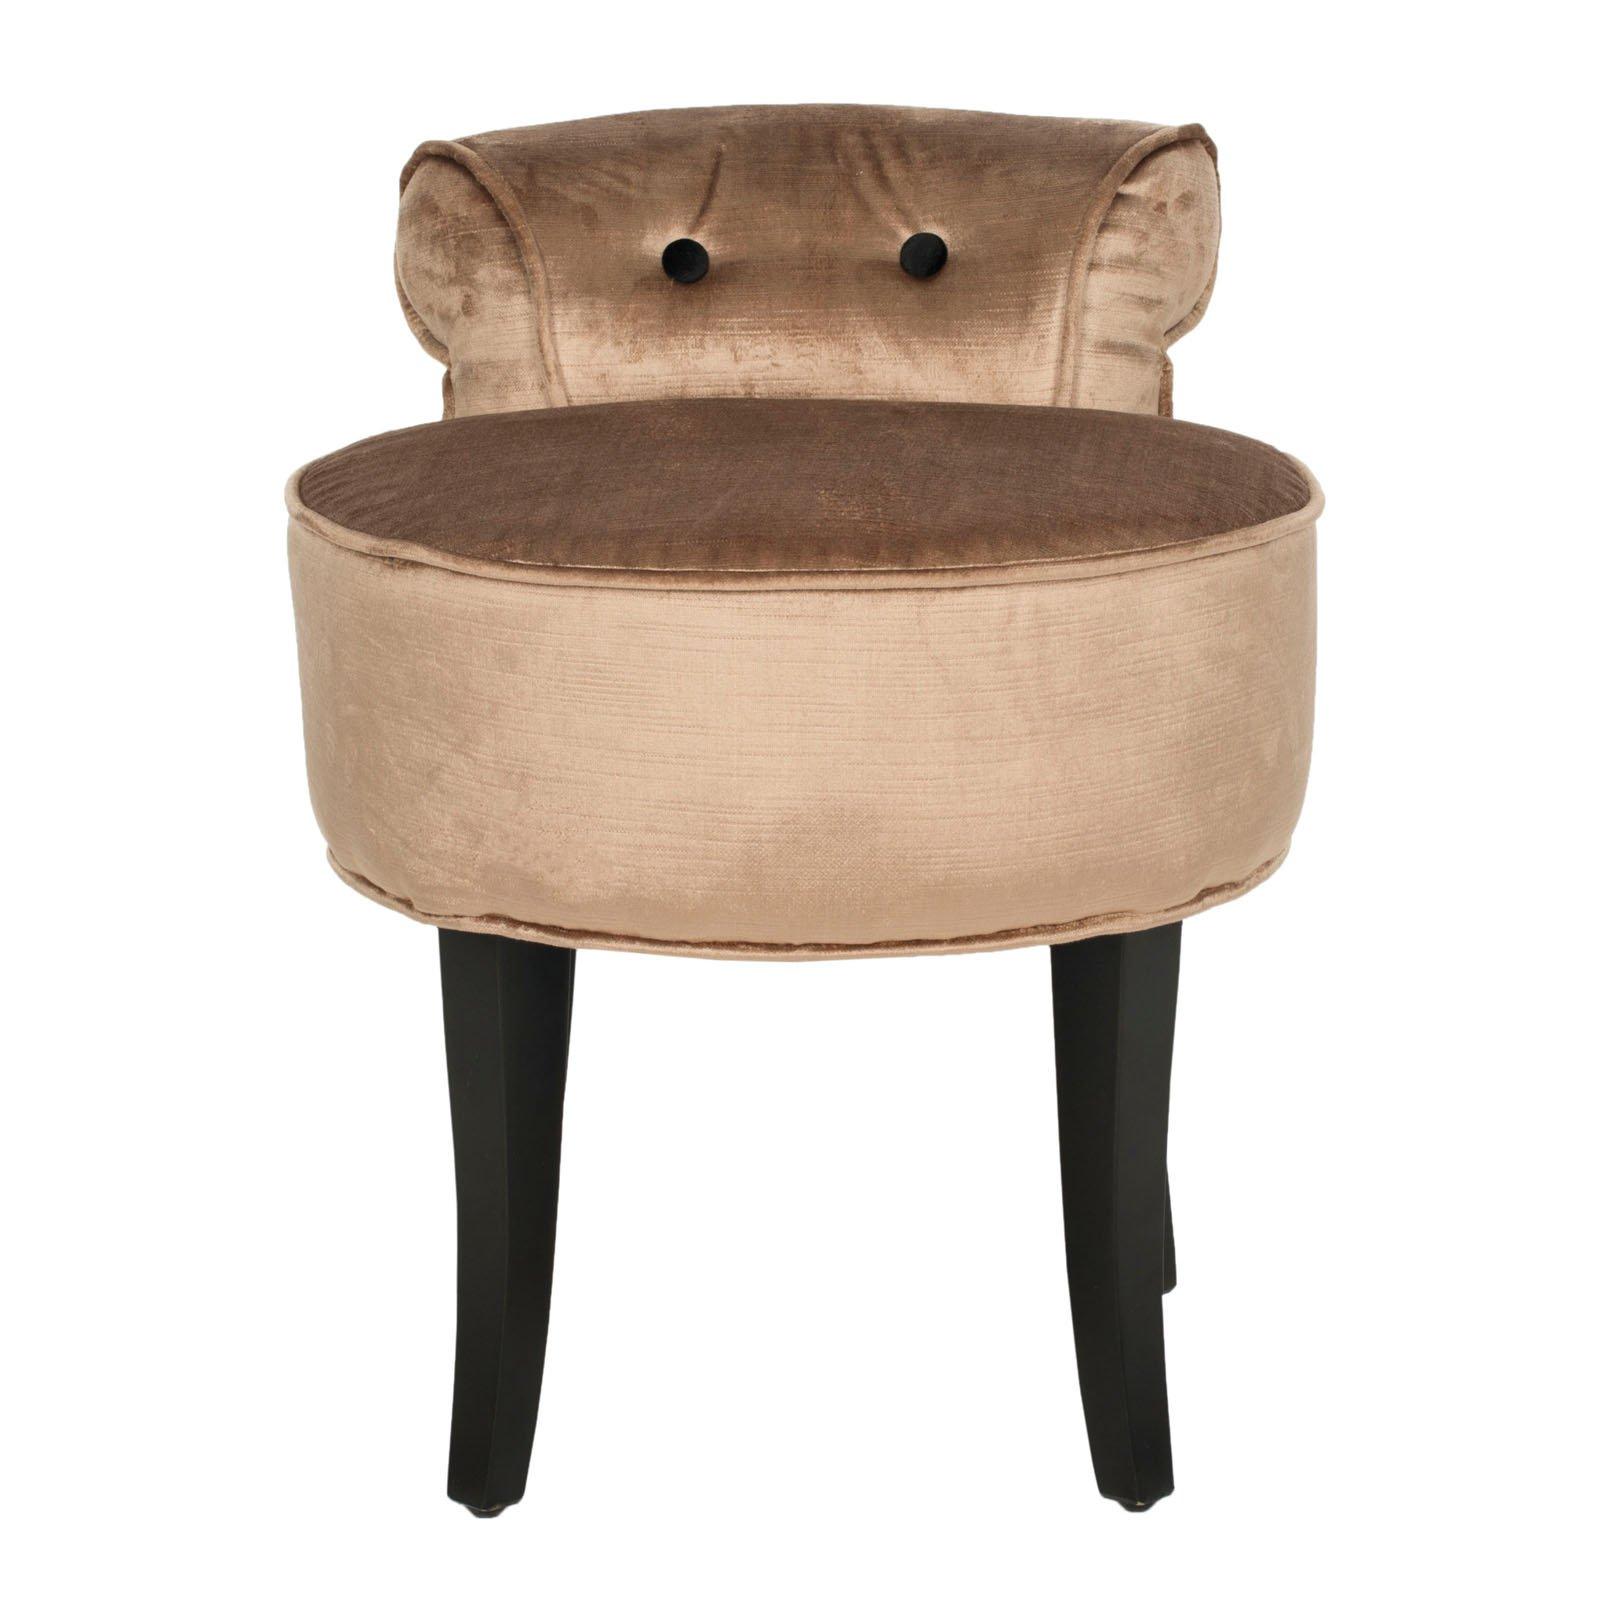 Amazing Safavieh Georgia Round Vanity Stool Mink Brown Products In Ibusinesslaw Wood Chair Design Ideas Ibusinesslaworg